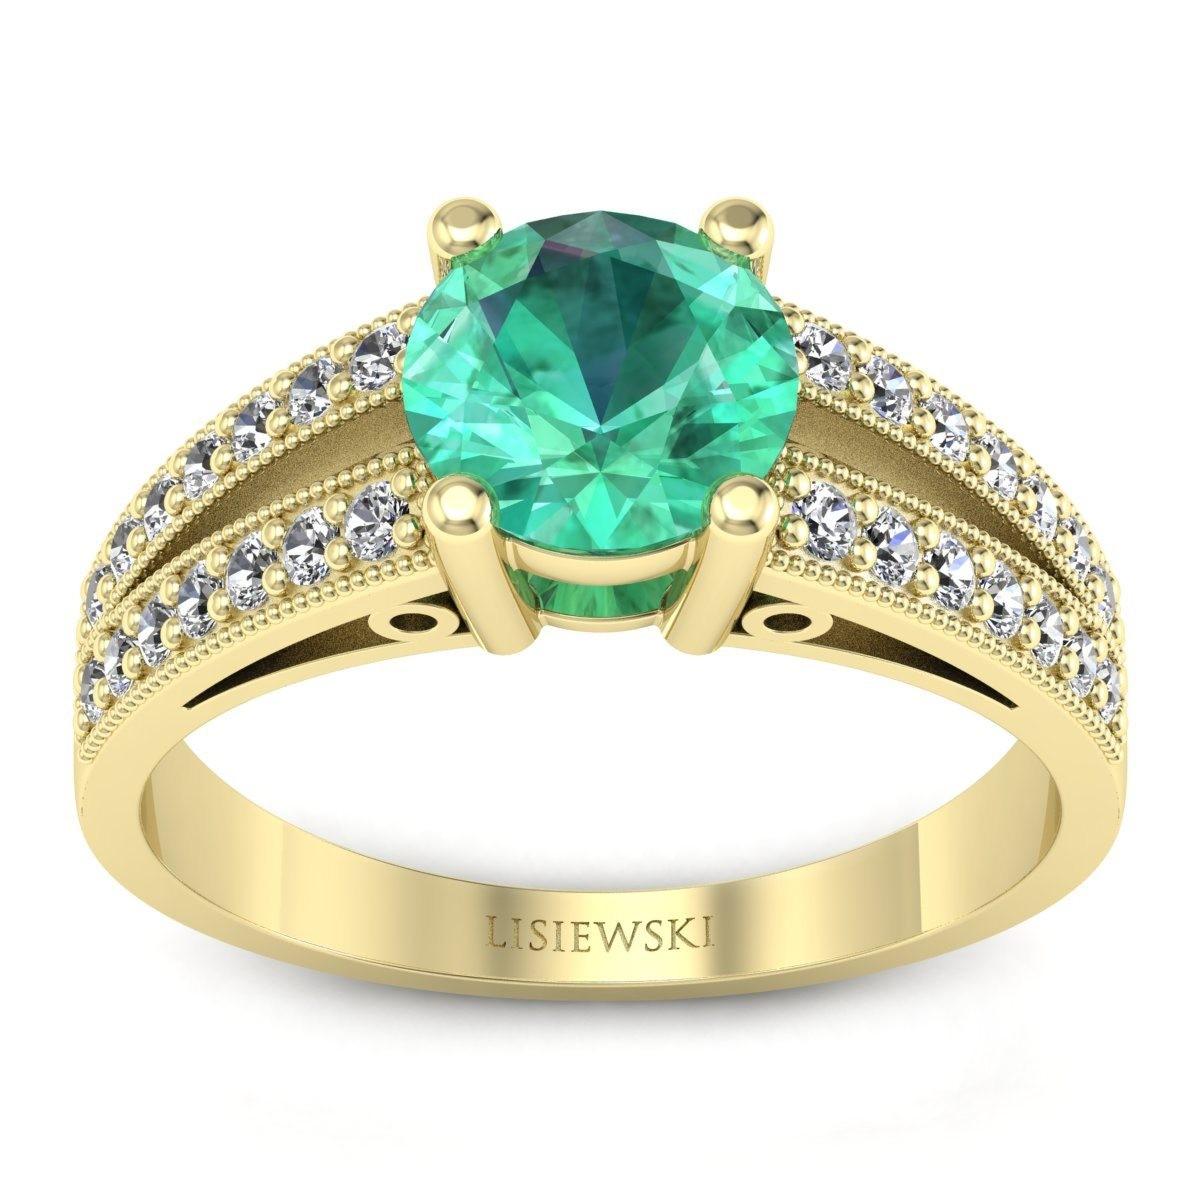 San Marino Złoty pierścionek ze szmaragdem i diamentami